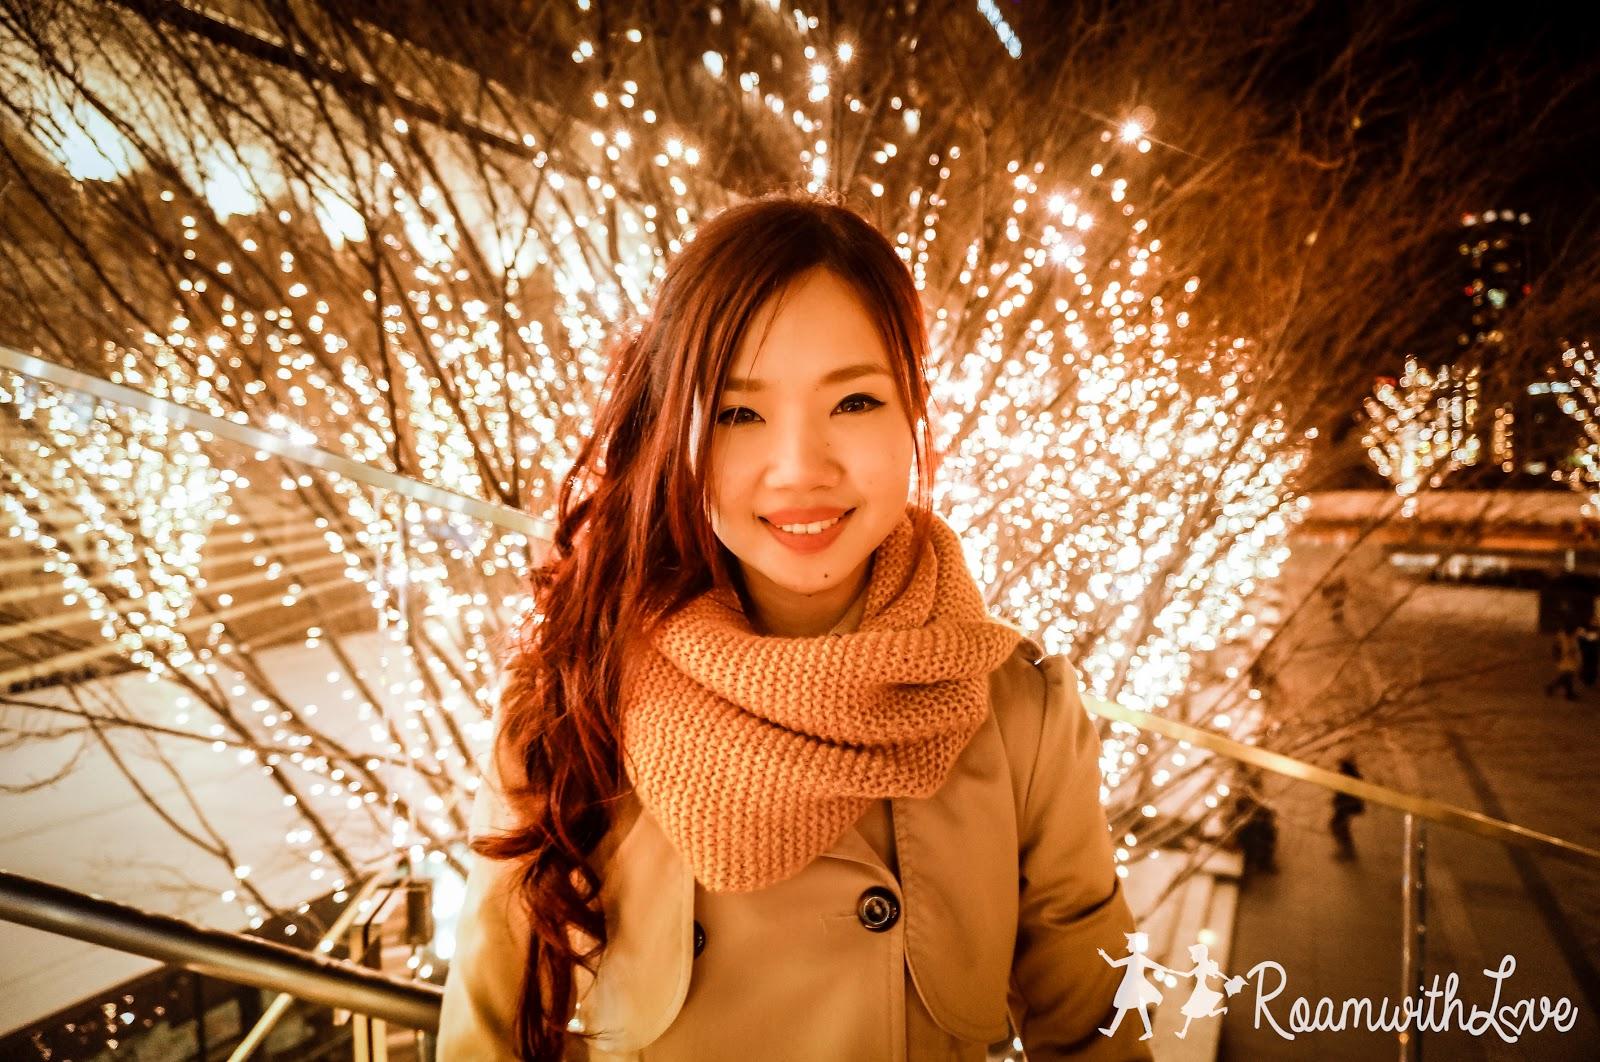 Japan,kyoto,review,เกีนวโต,รีวิว,ทริป,สวีท,ญี่ปุ่น,คันไซ,osaka,station